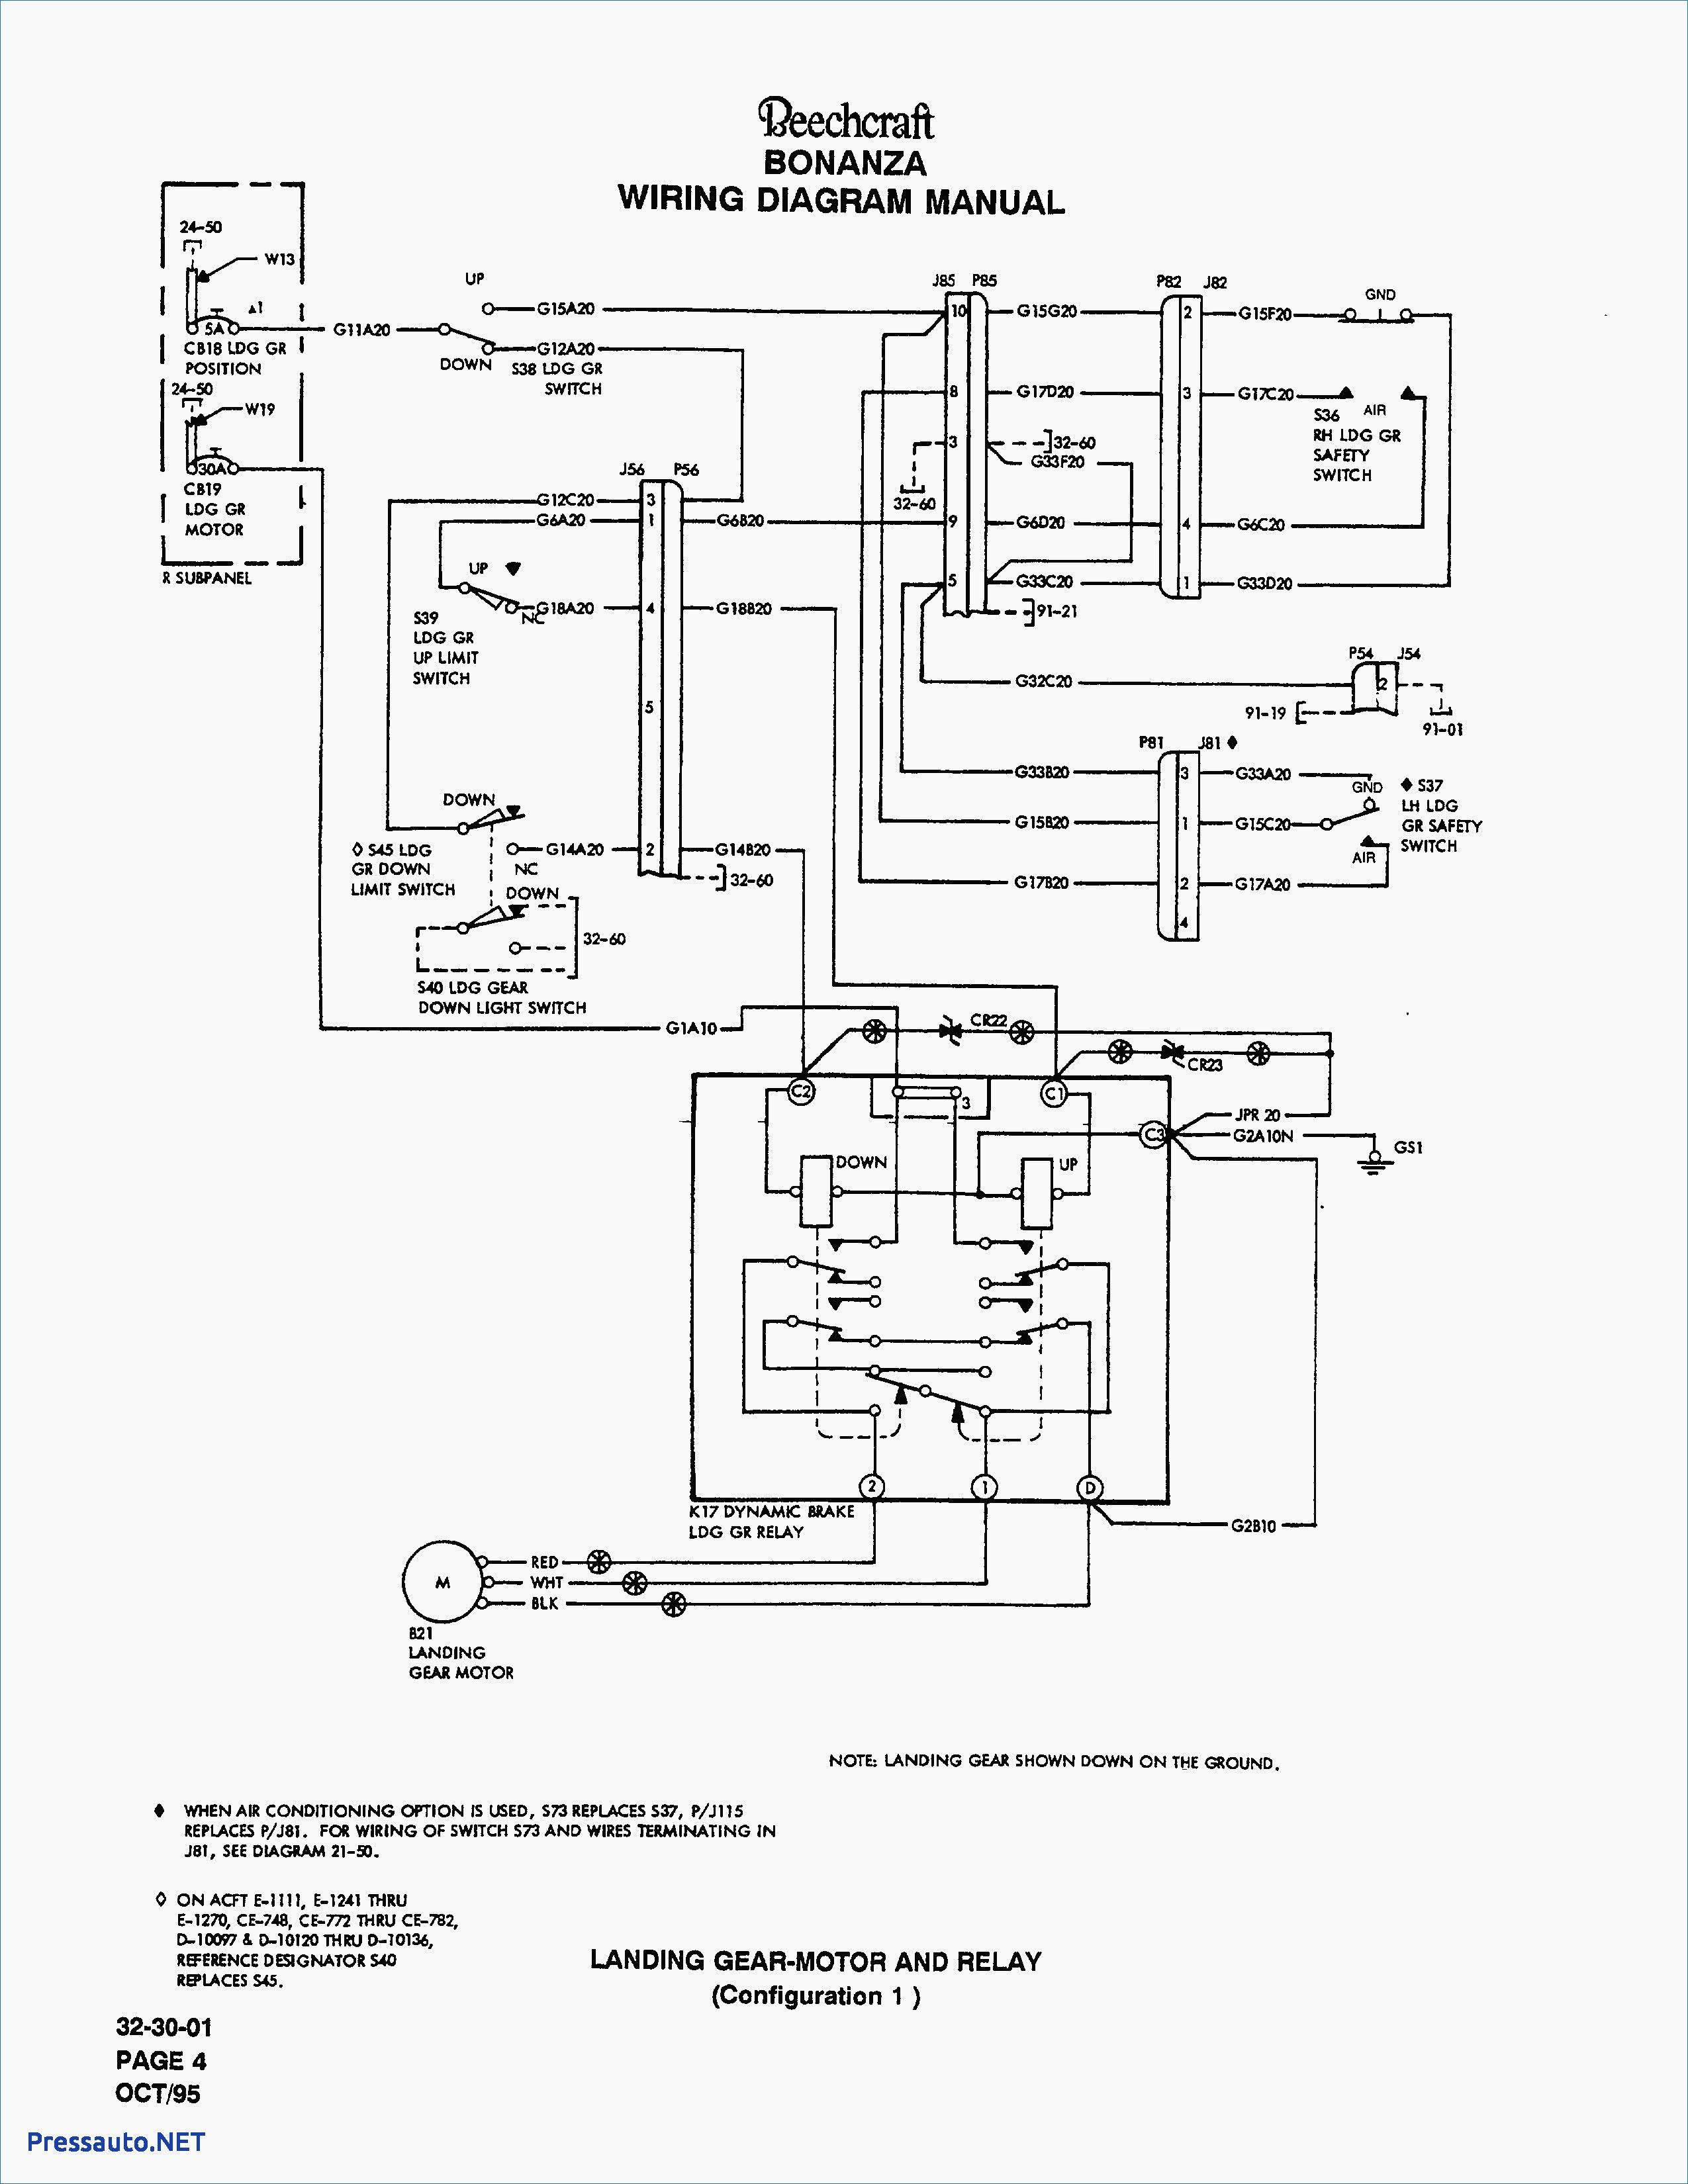 Suburban Water Heater Switch Wiring Diagram